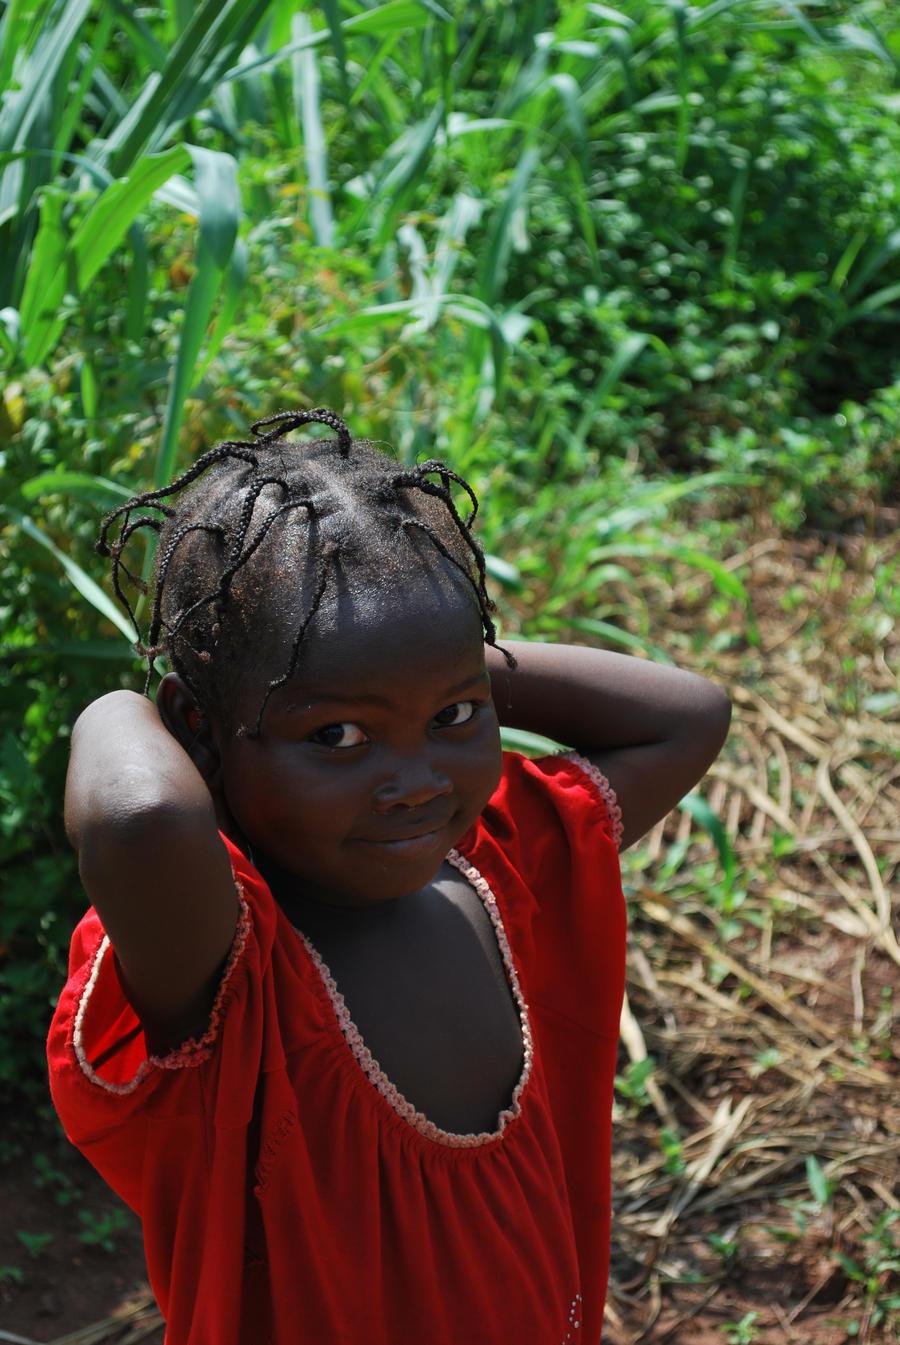 African girl by Abenn